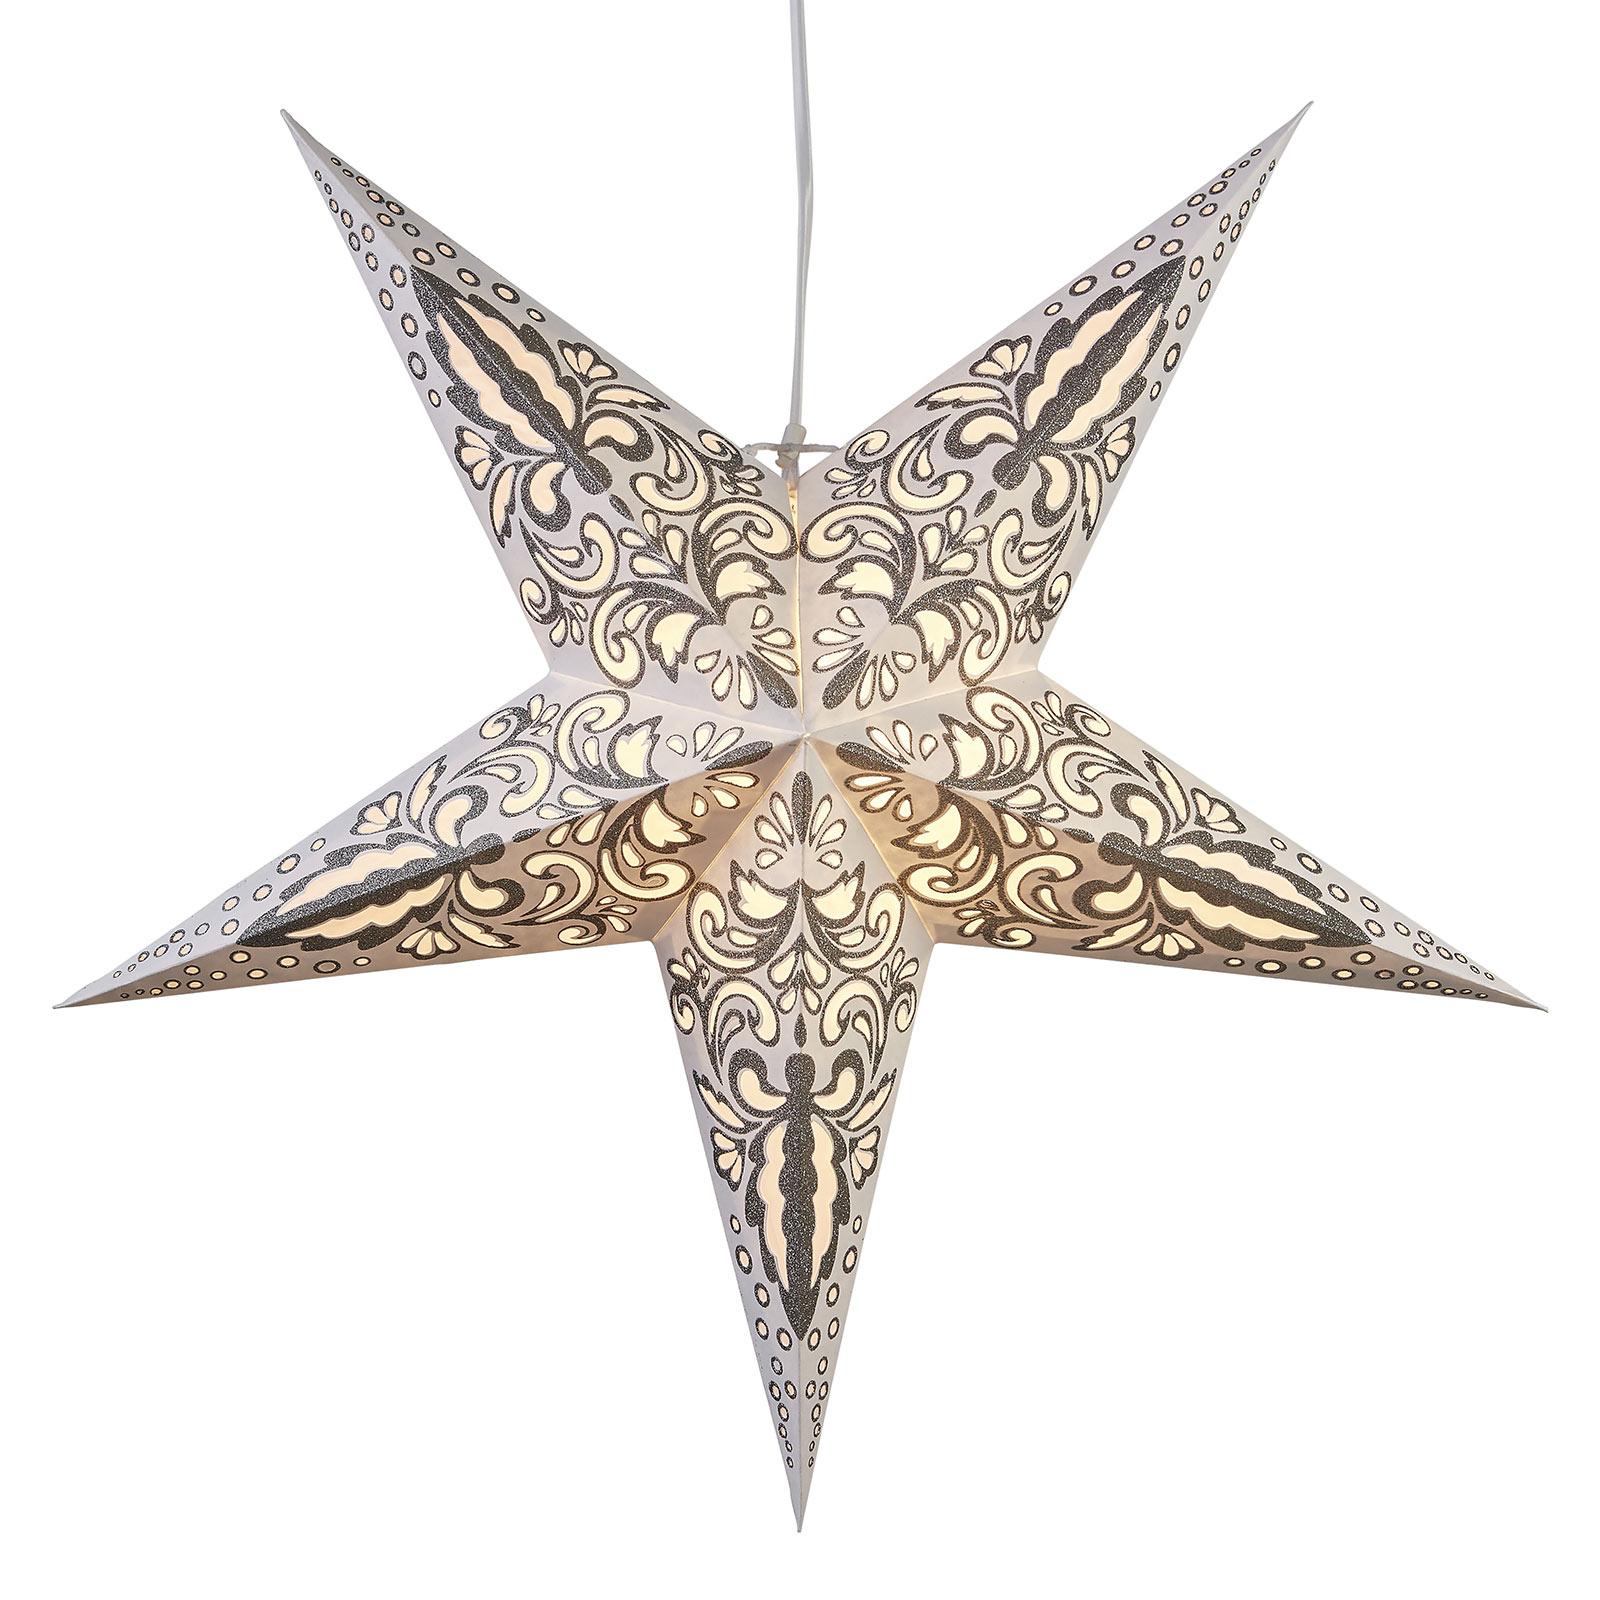 Papírová hvězda Blaze 5cípá, vzorovaná, bílá